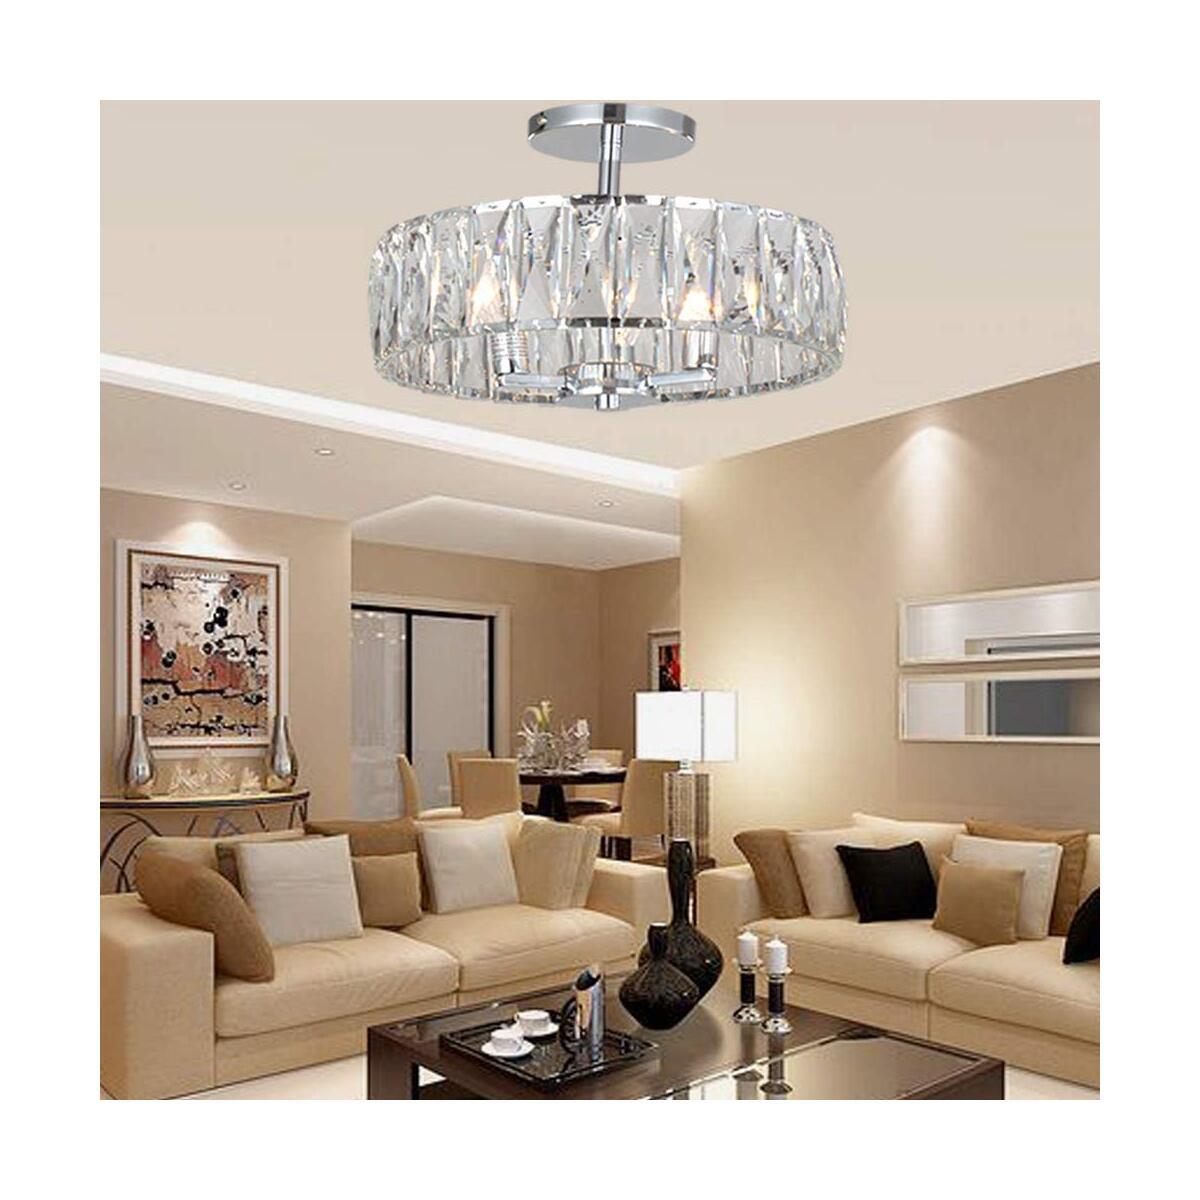 Modern 3-Light Crystal Ceiling Light, 13